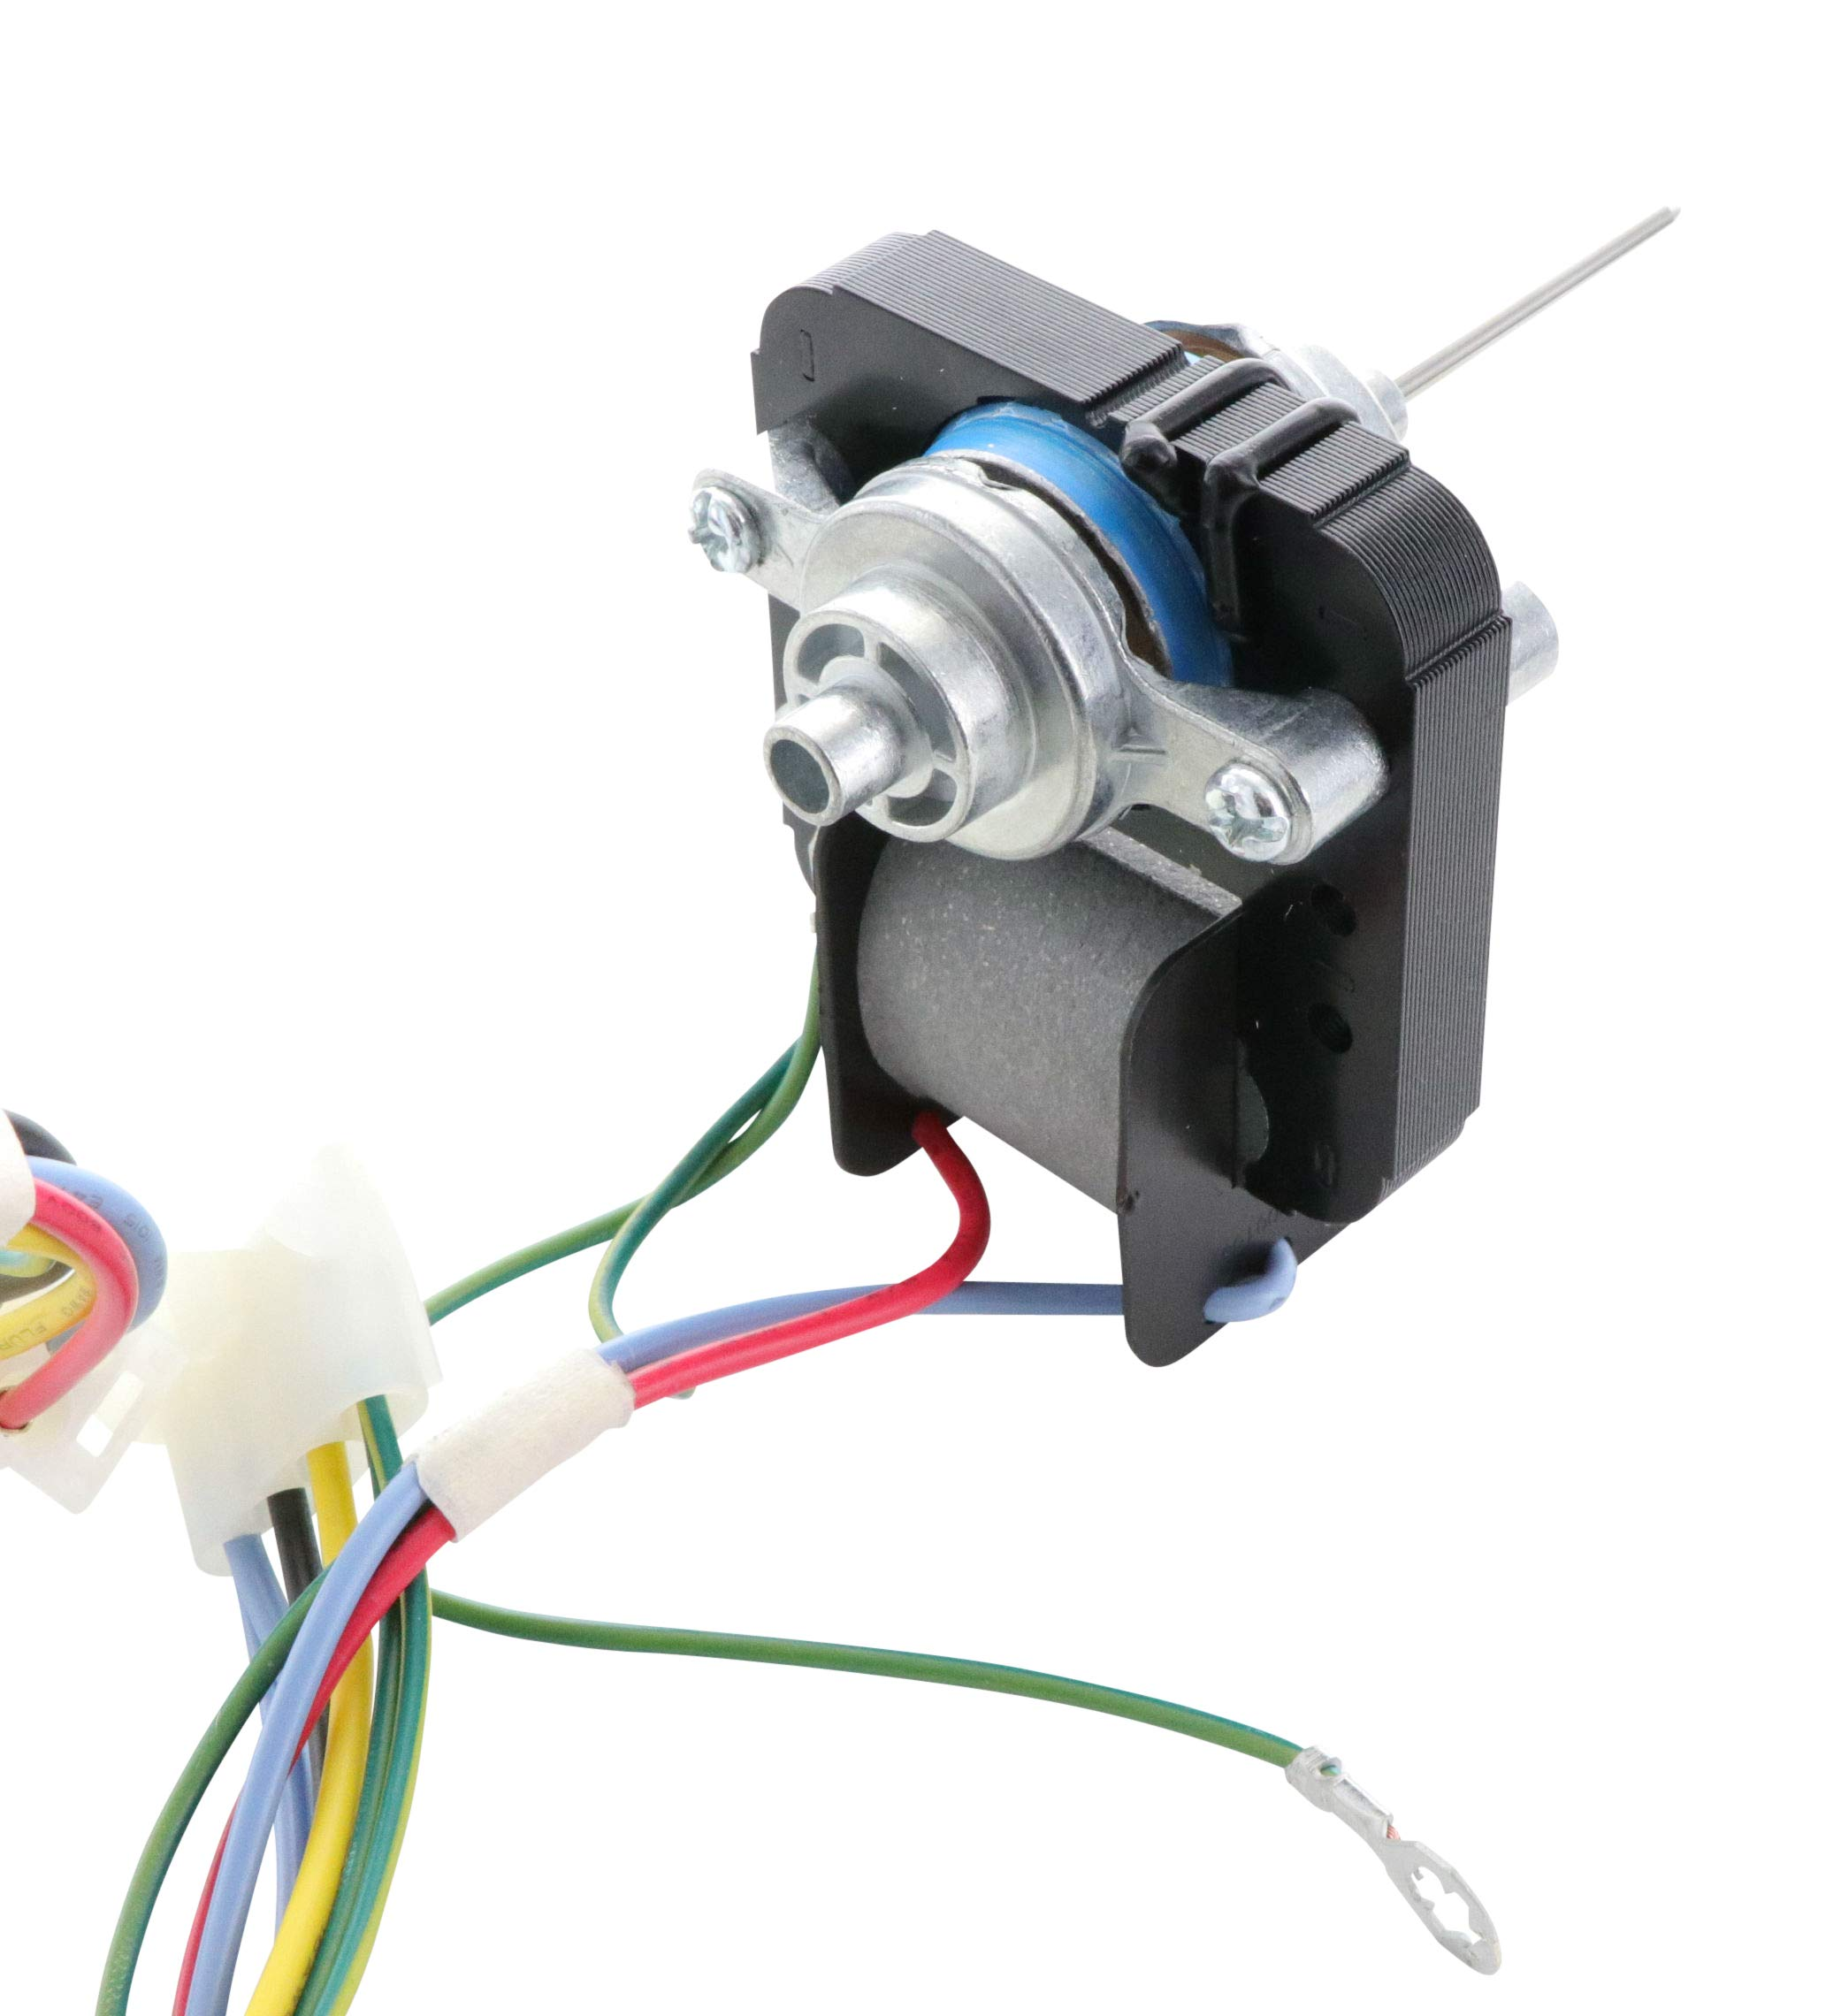 Endurance Pro 241854301, 5303918549 Refrigerator Evaporator Fan Motor Kit Replacement for Electrolux Frigidaire AP4343697 by Endurance Pro